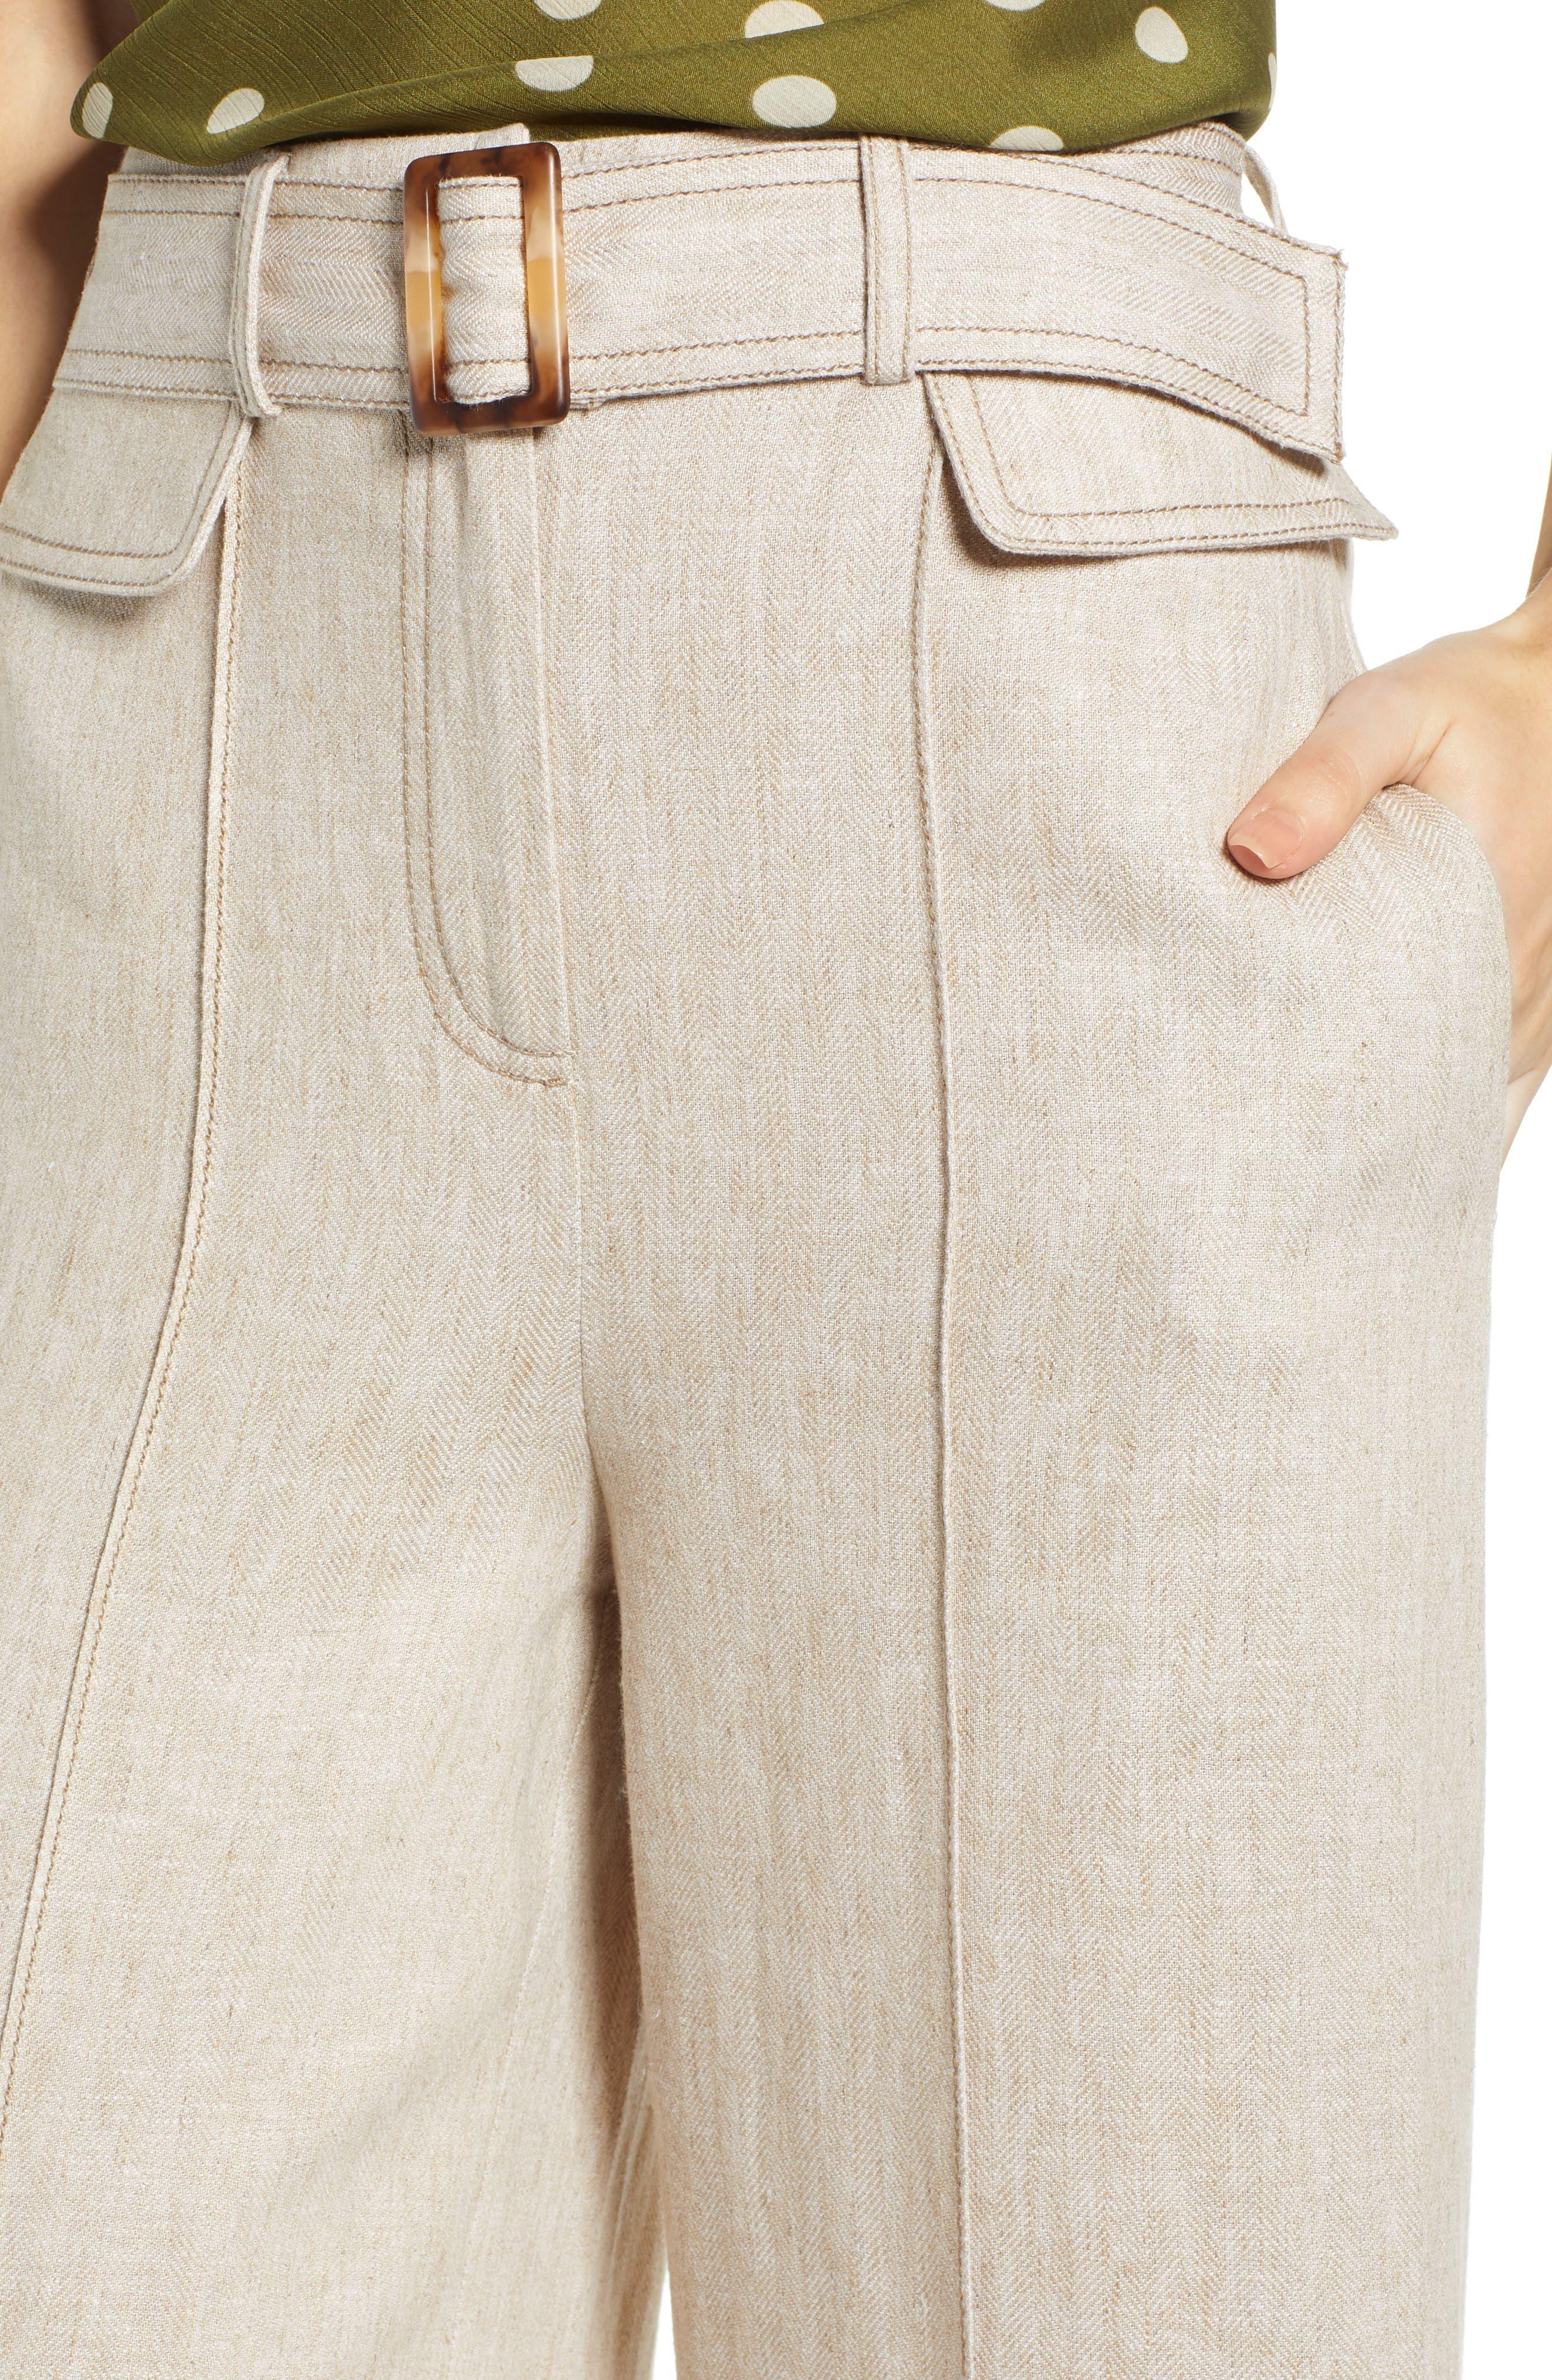 CHRISELLE LIM COLLECTION, Chriselle Lim Toulouse Wide Leg Crop Trousers, Alternate thumbnail 5, color, OATMEAL